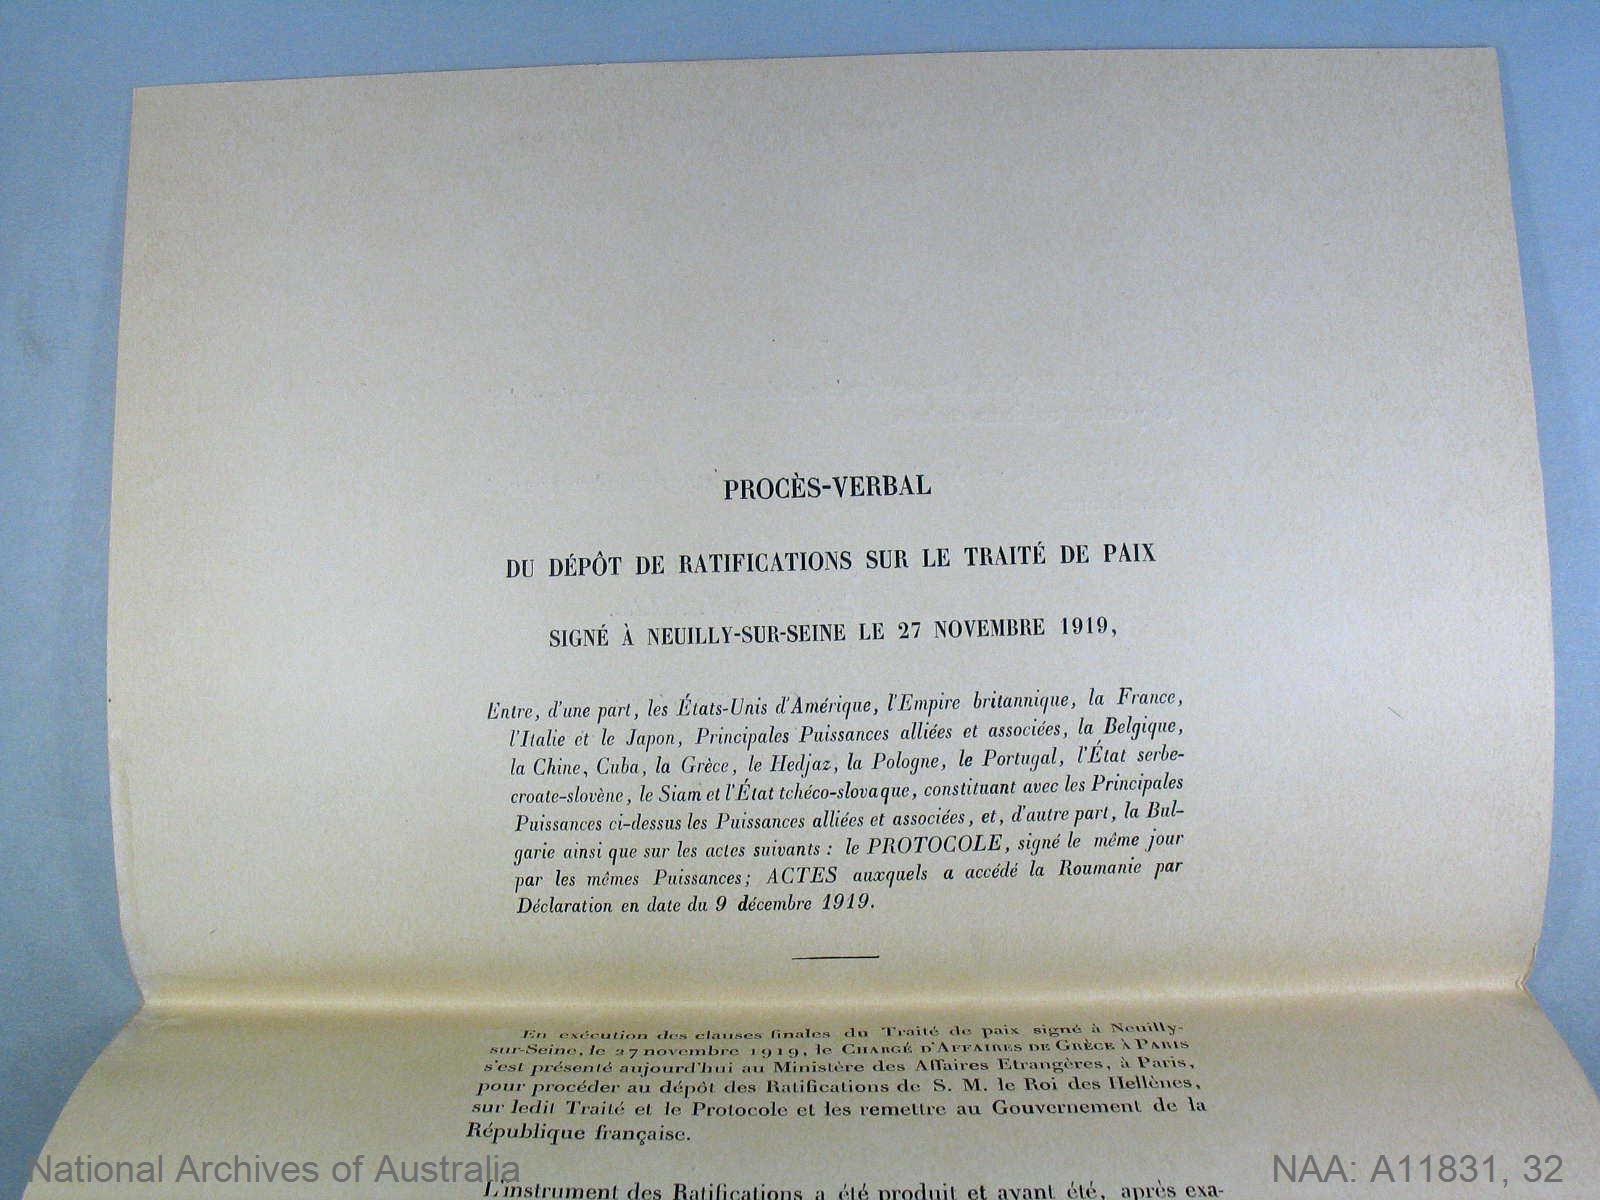 Proces-Verbal du depot de ratifications sur le traite de Paix signe a Neuilly-sur-Seine le 27 Novembre 1919 [Proces-Verbal recording the deposit of the Ratification of the Treaty of Peace with Bulgaria by Greece]